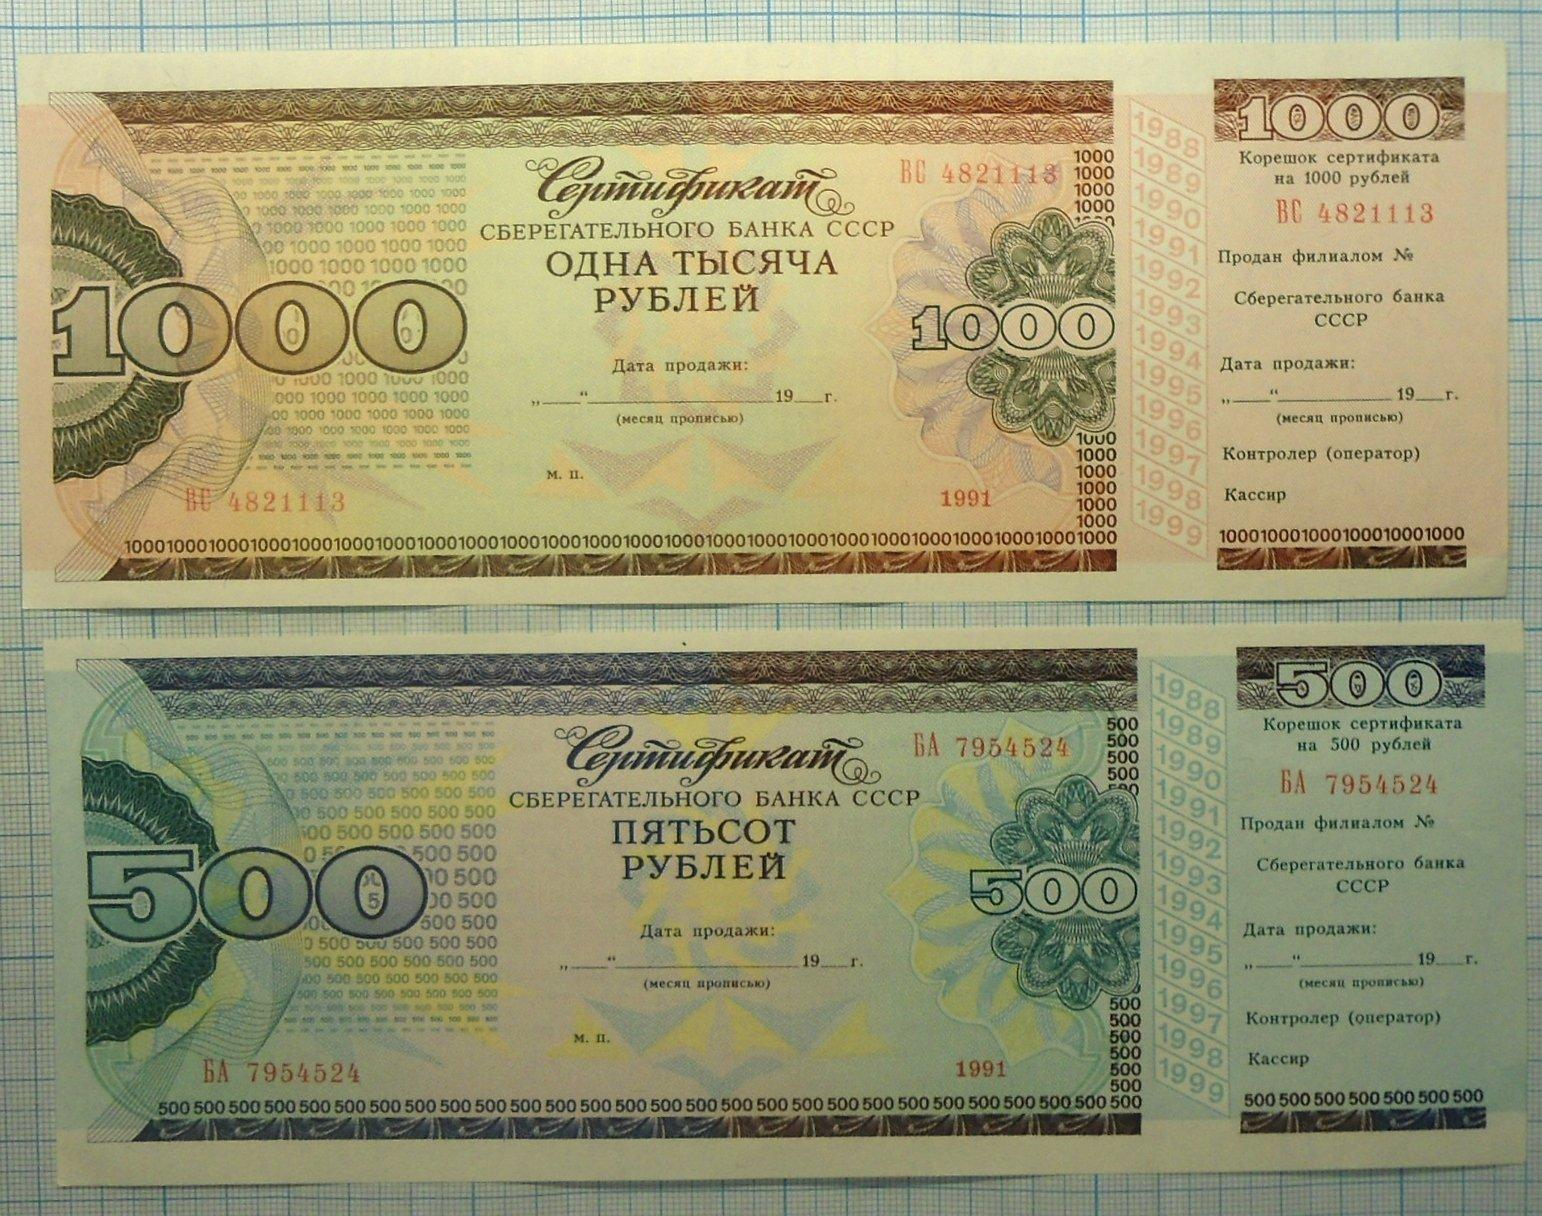 Сертификаты советского банка